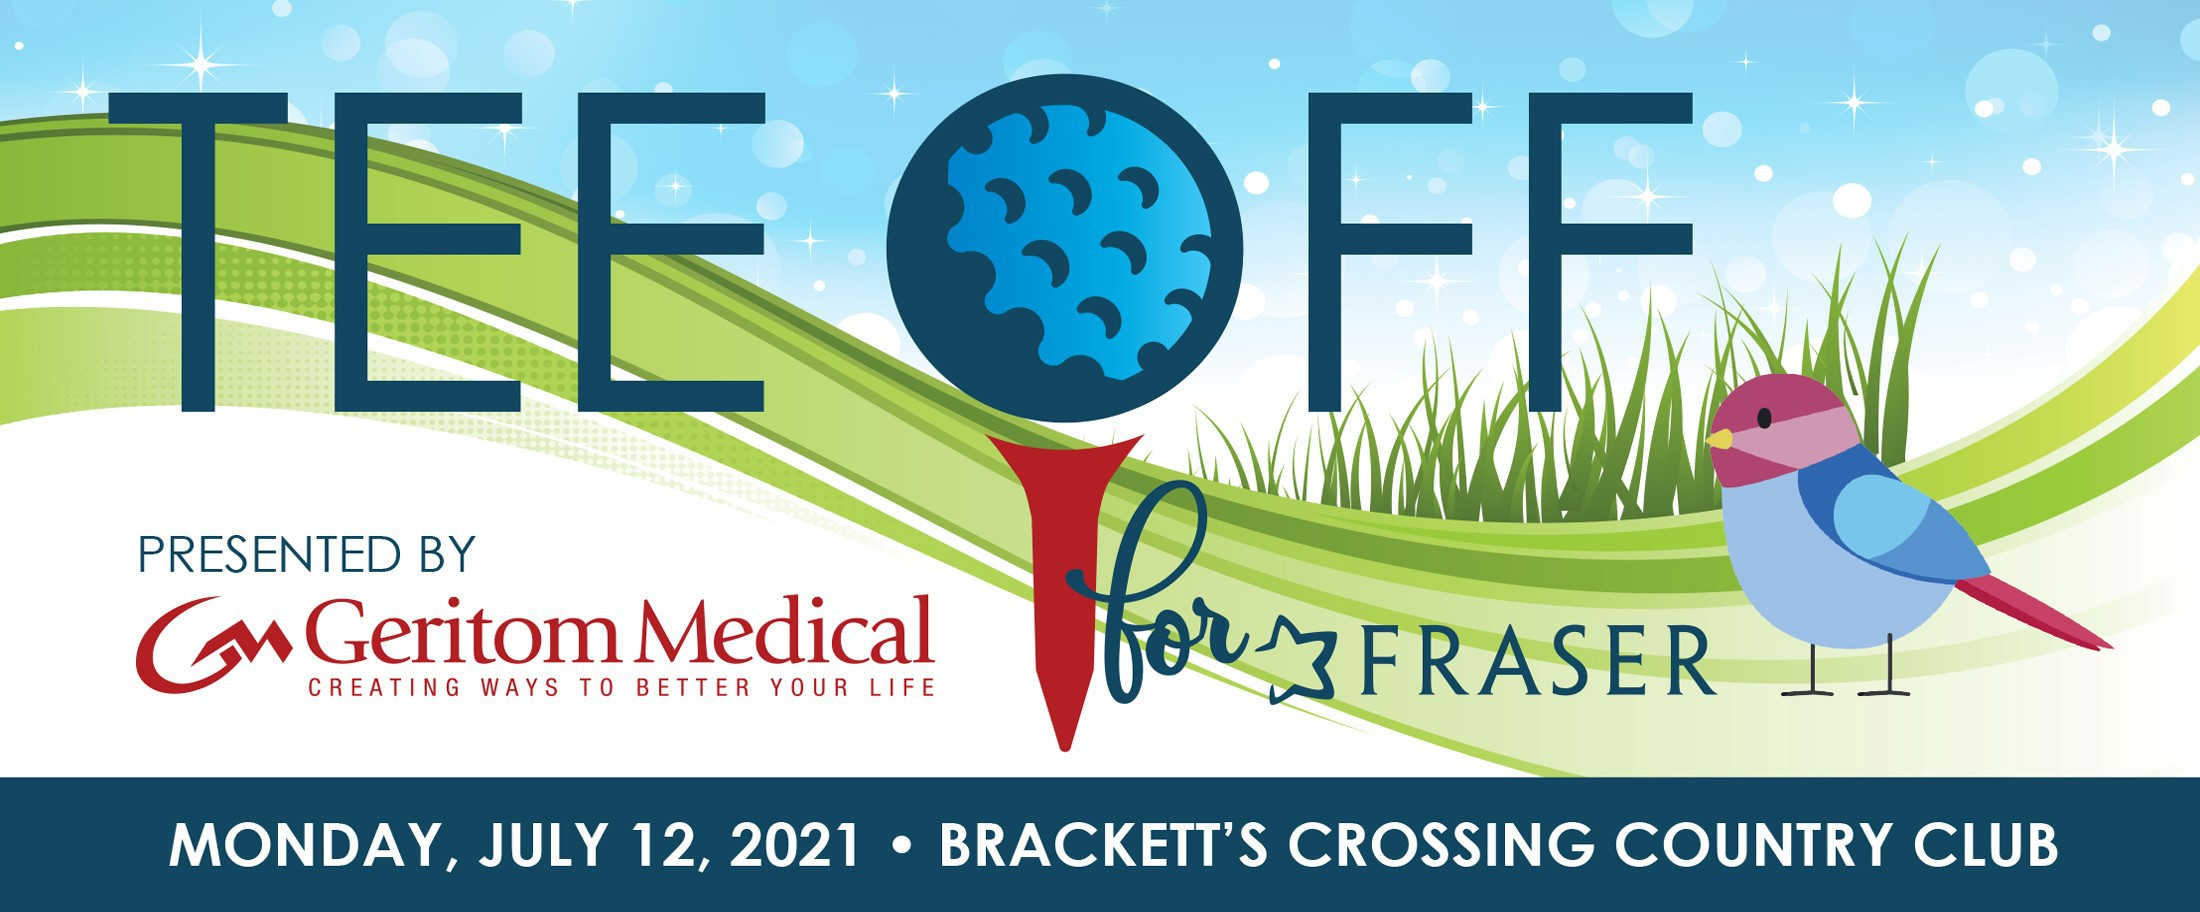 2021 Tee Off for Fraser, Presented by Geritom Medical